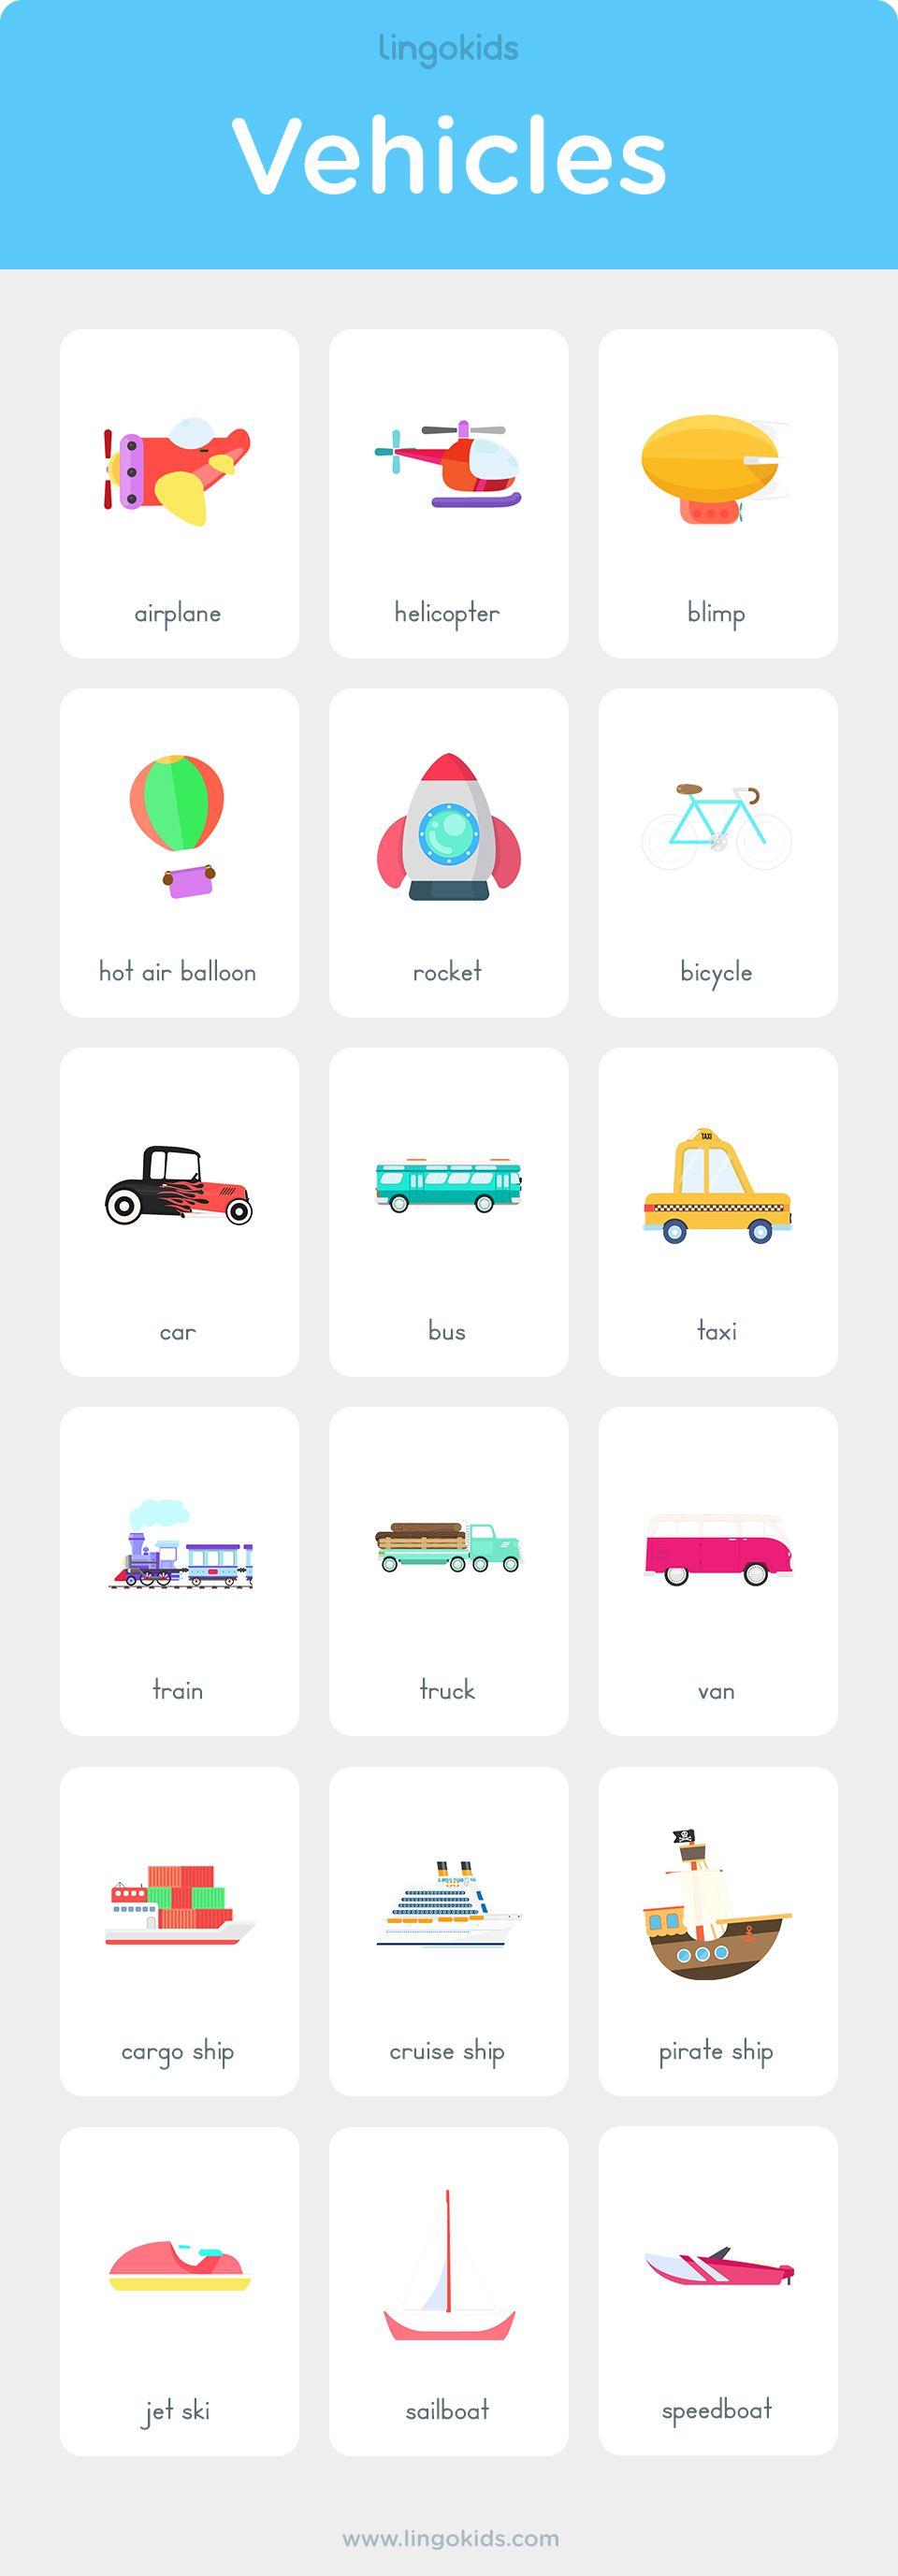 modes of transport matayus education english transportation preschool activities. Black Bedroom Furniture Sets. Home Design Ideas